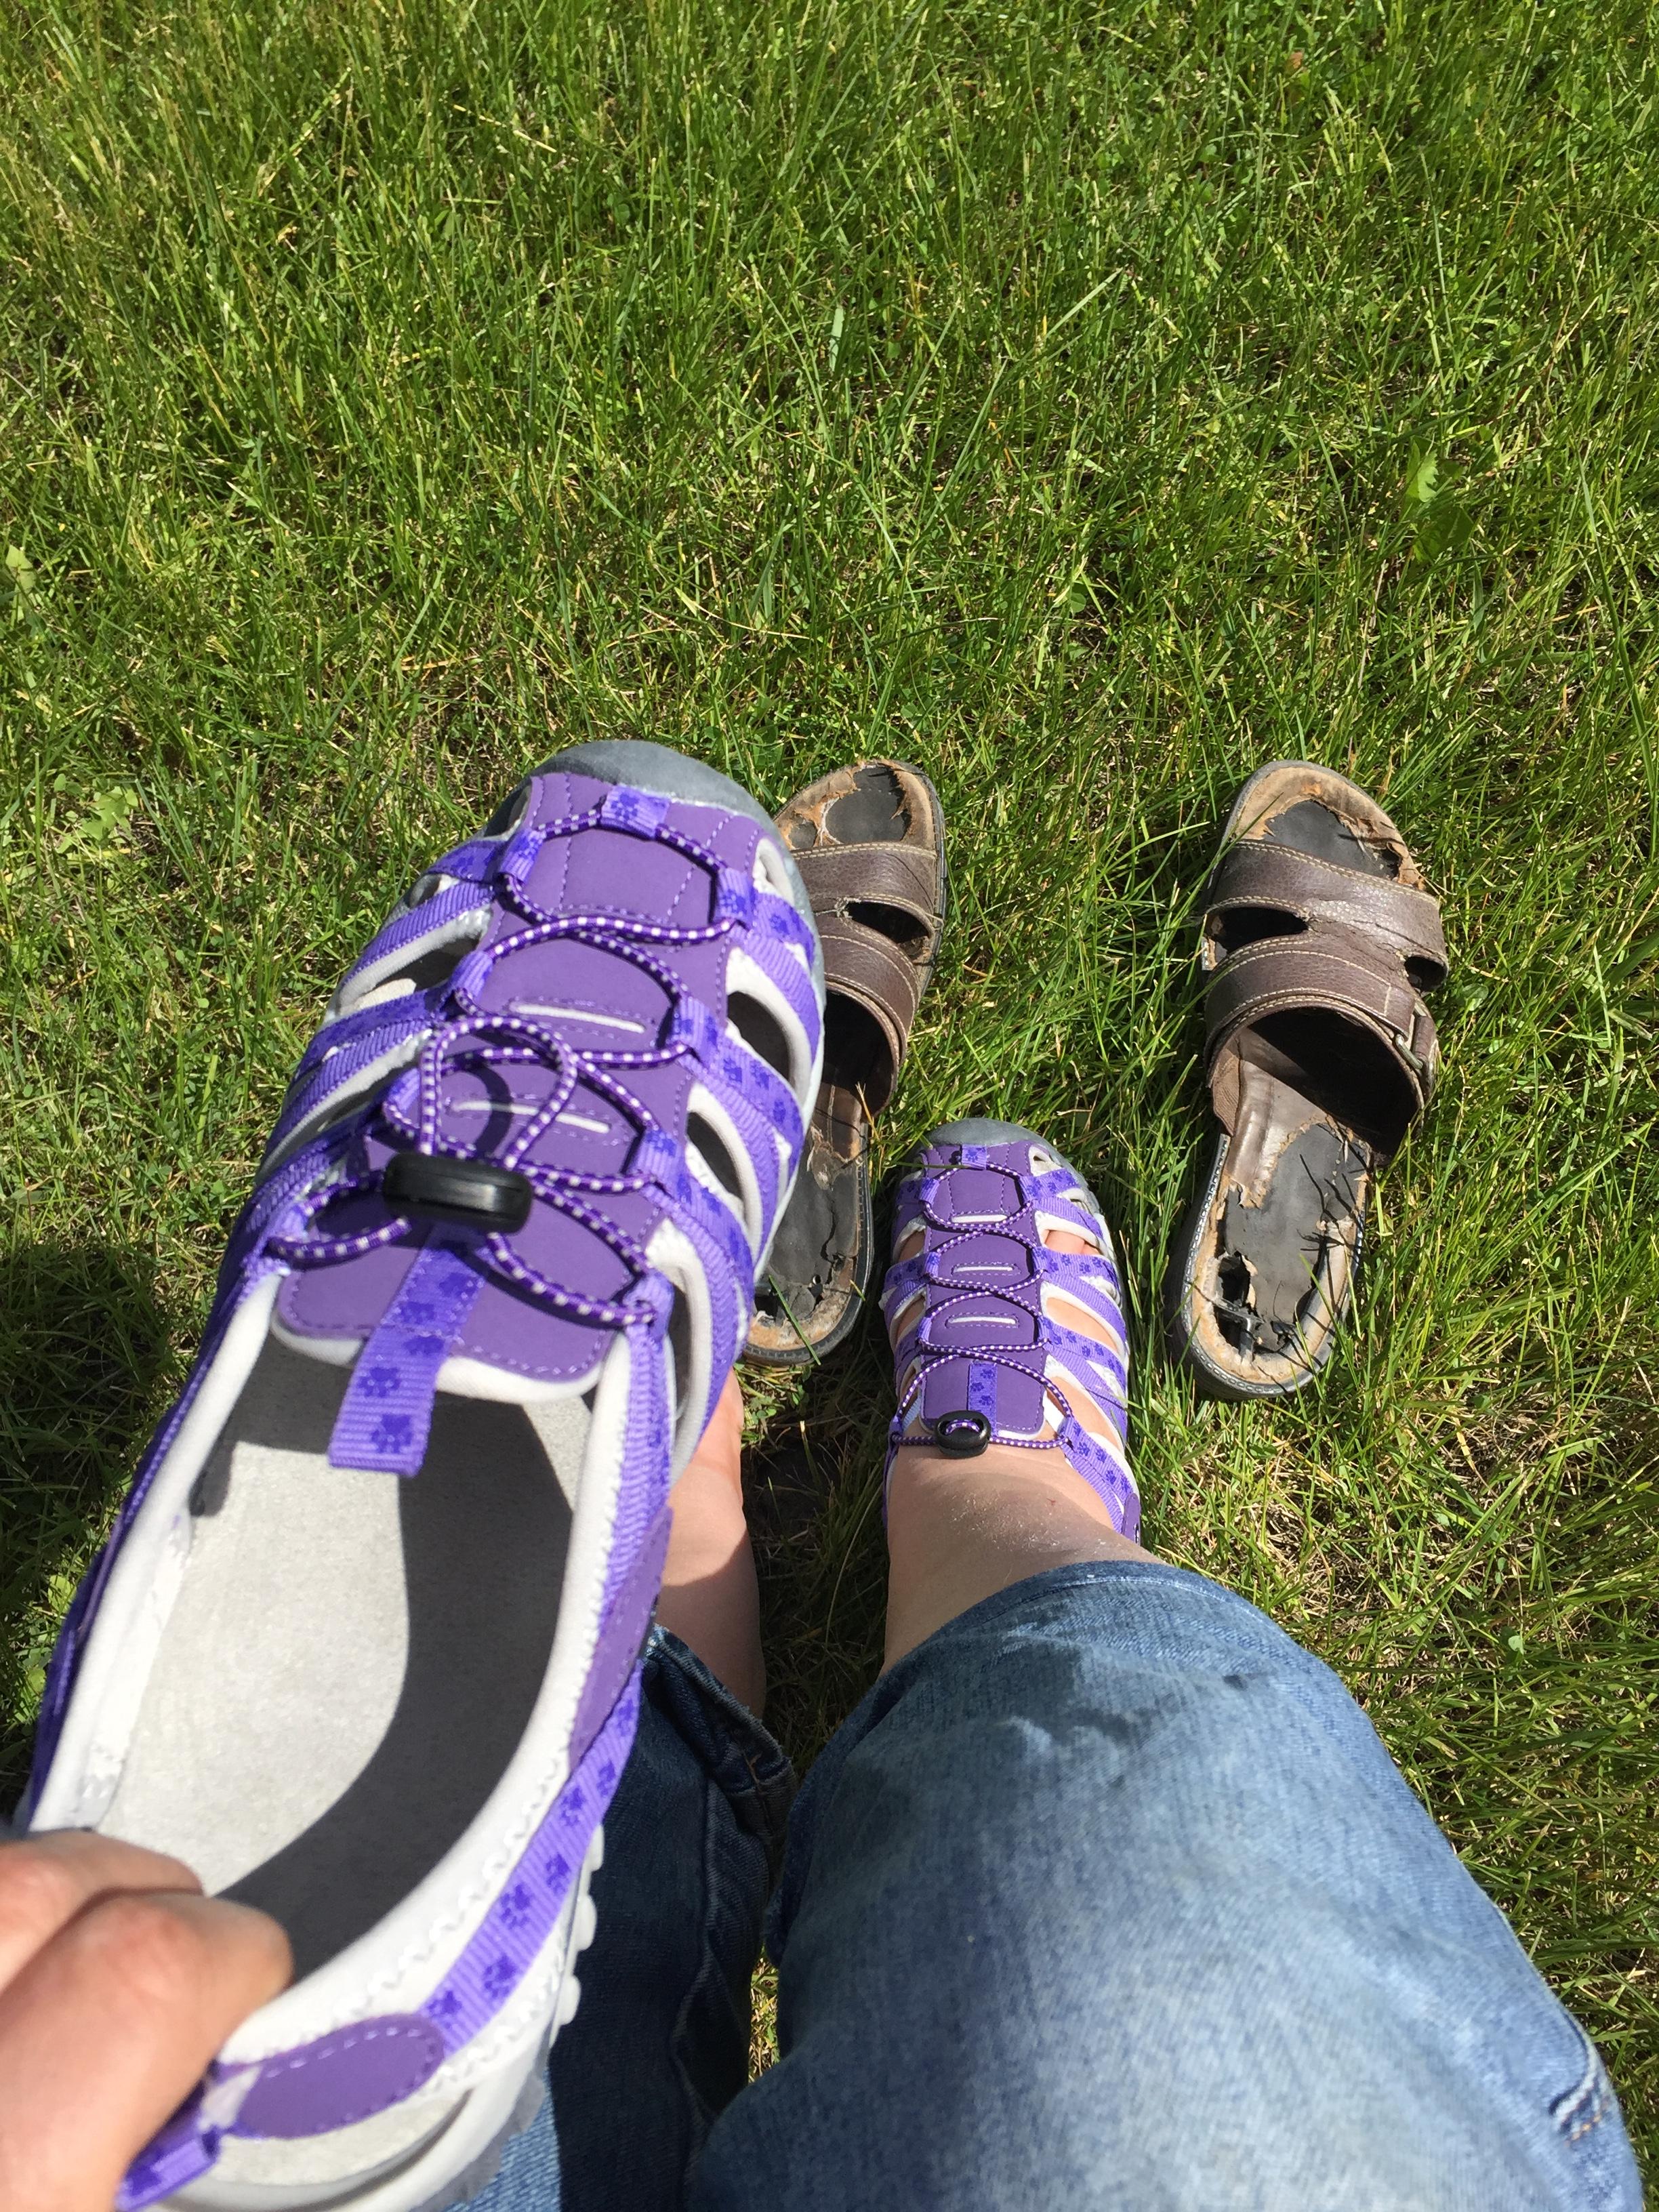 GArdenShoes